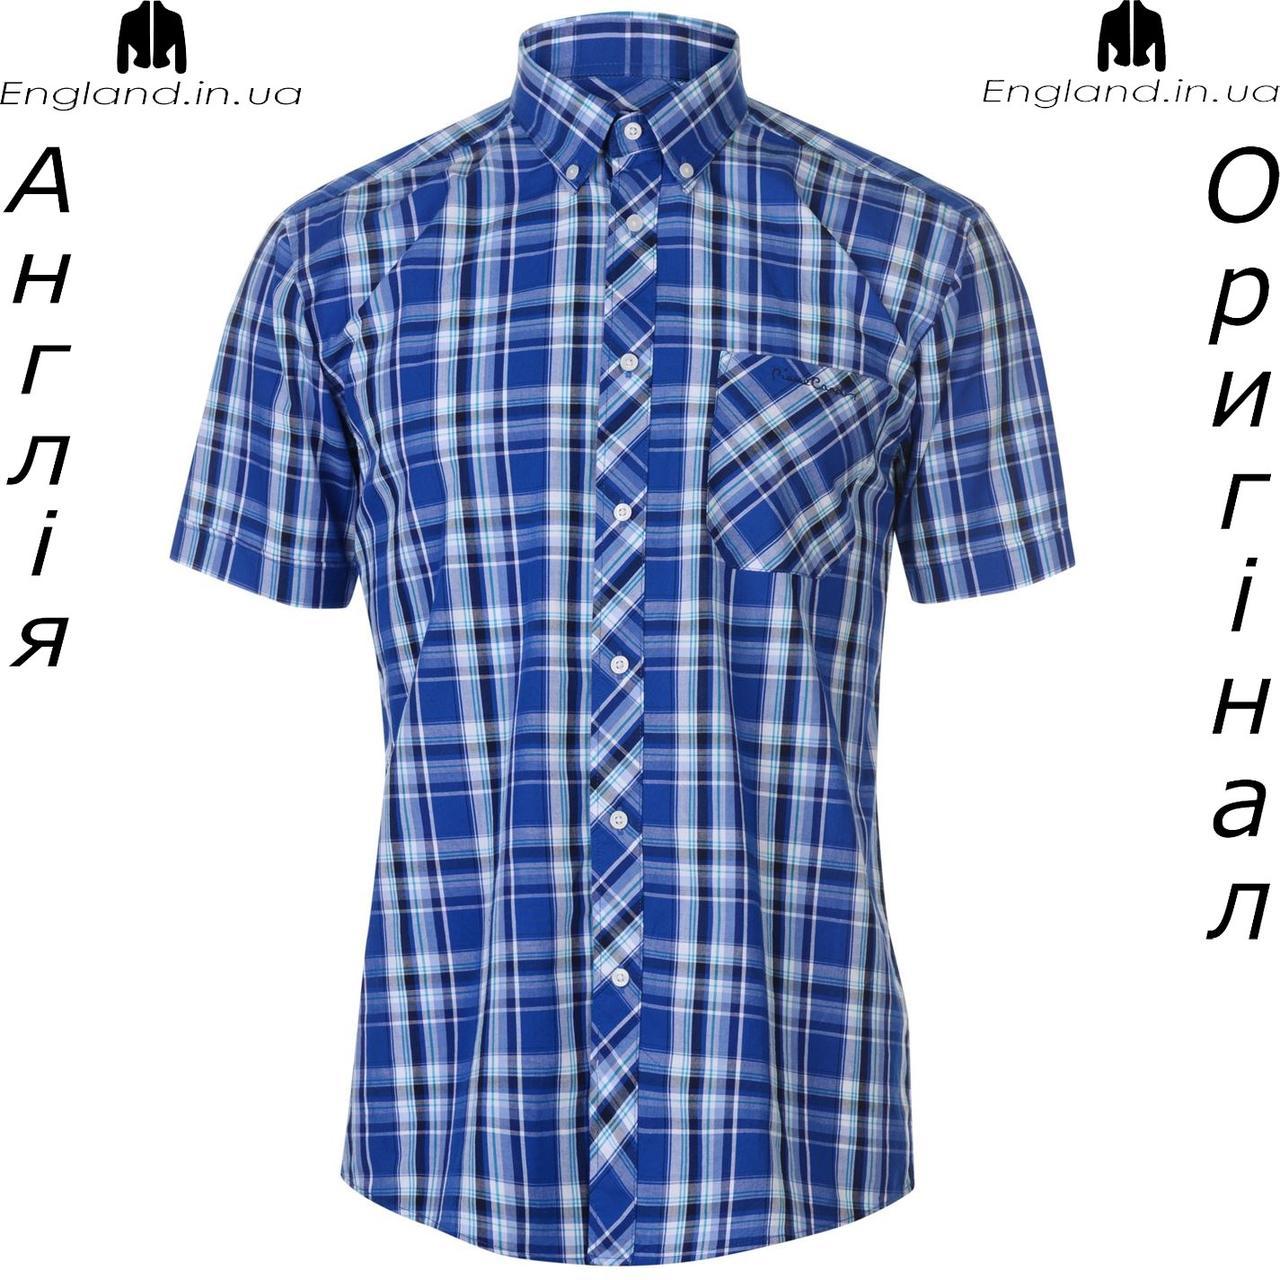 3777a4f273798e5 Рубашка в клетку мужская Pierre Cardin из Англии - на короткий рукав -  Интернет-магазин